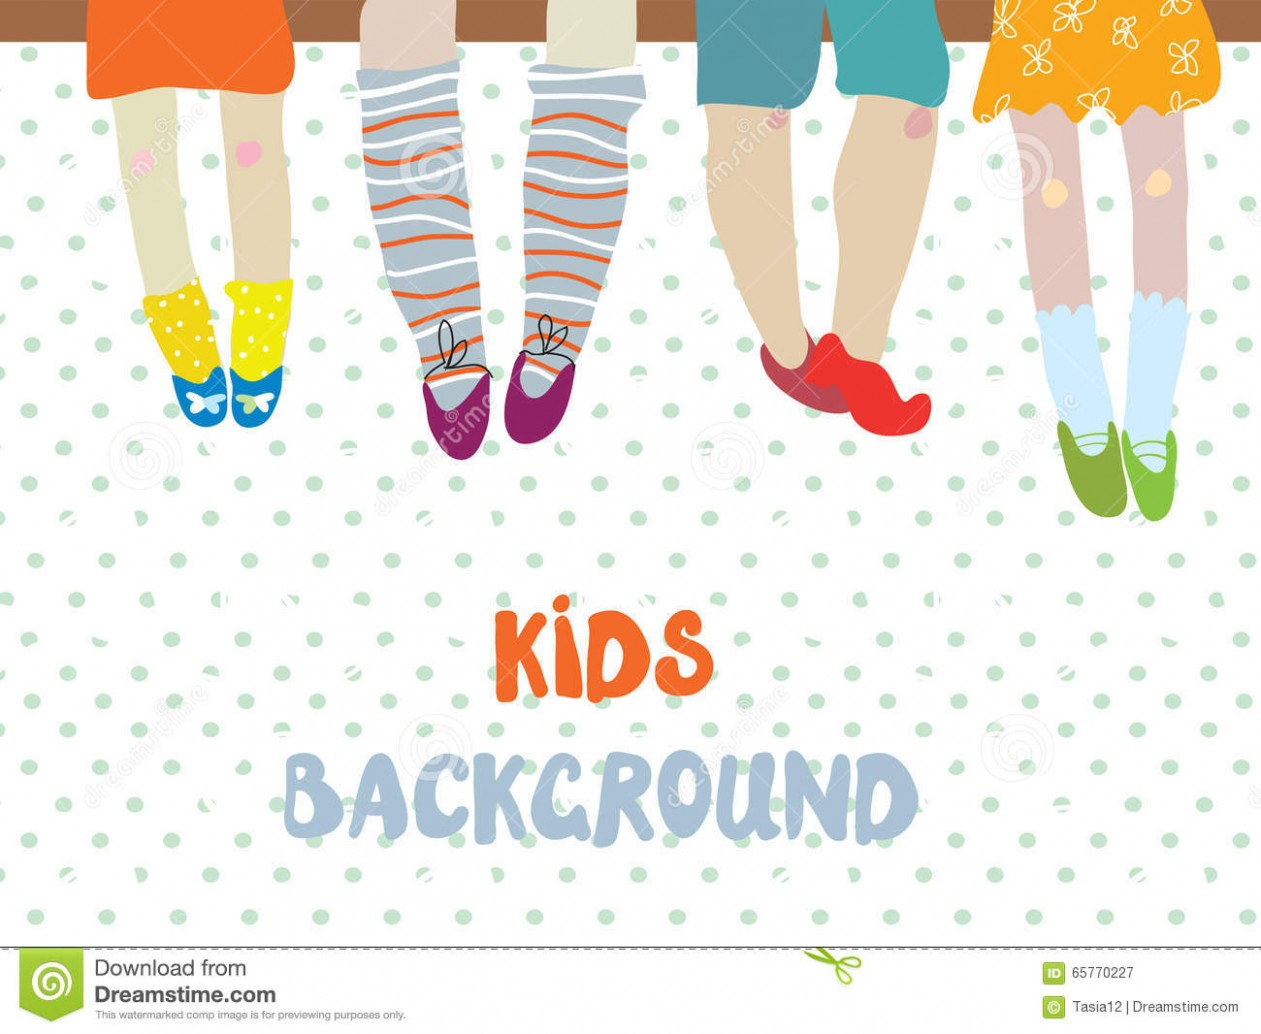 thank you card template kindergarten  Kids Background For Kindergarten Banner Or Card - Funny ..